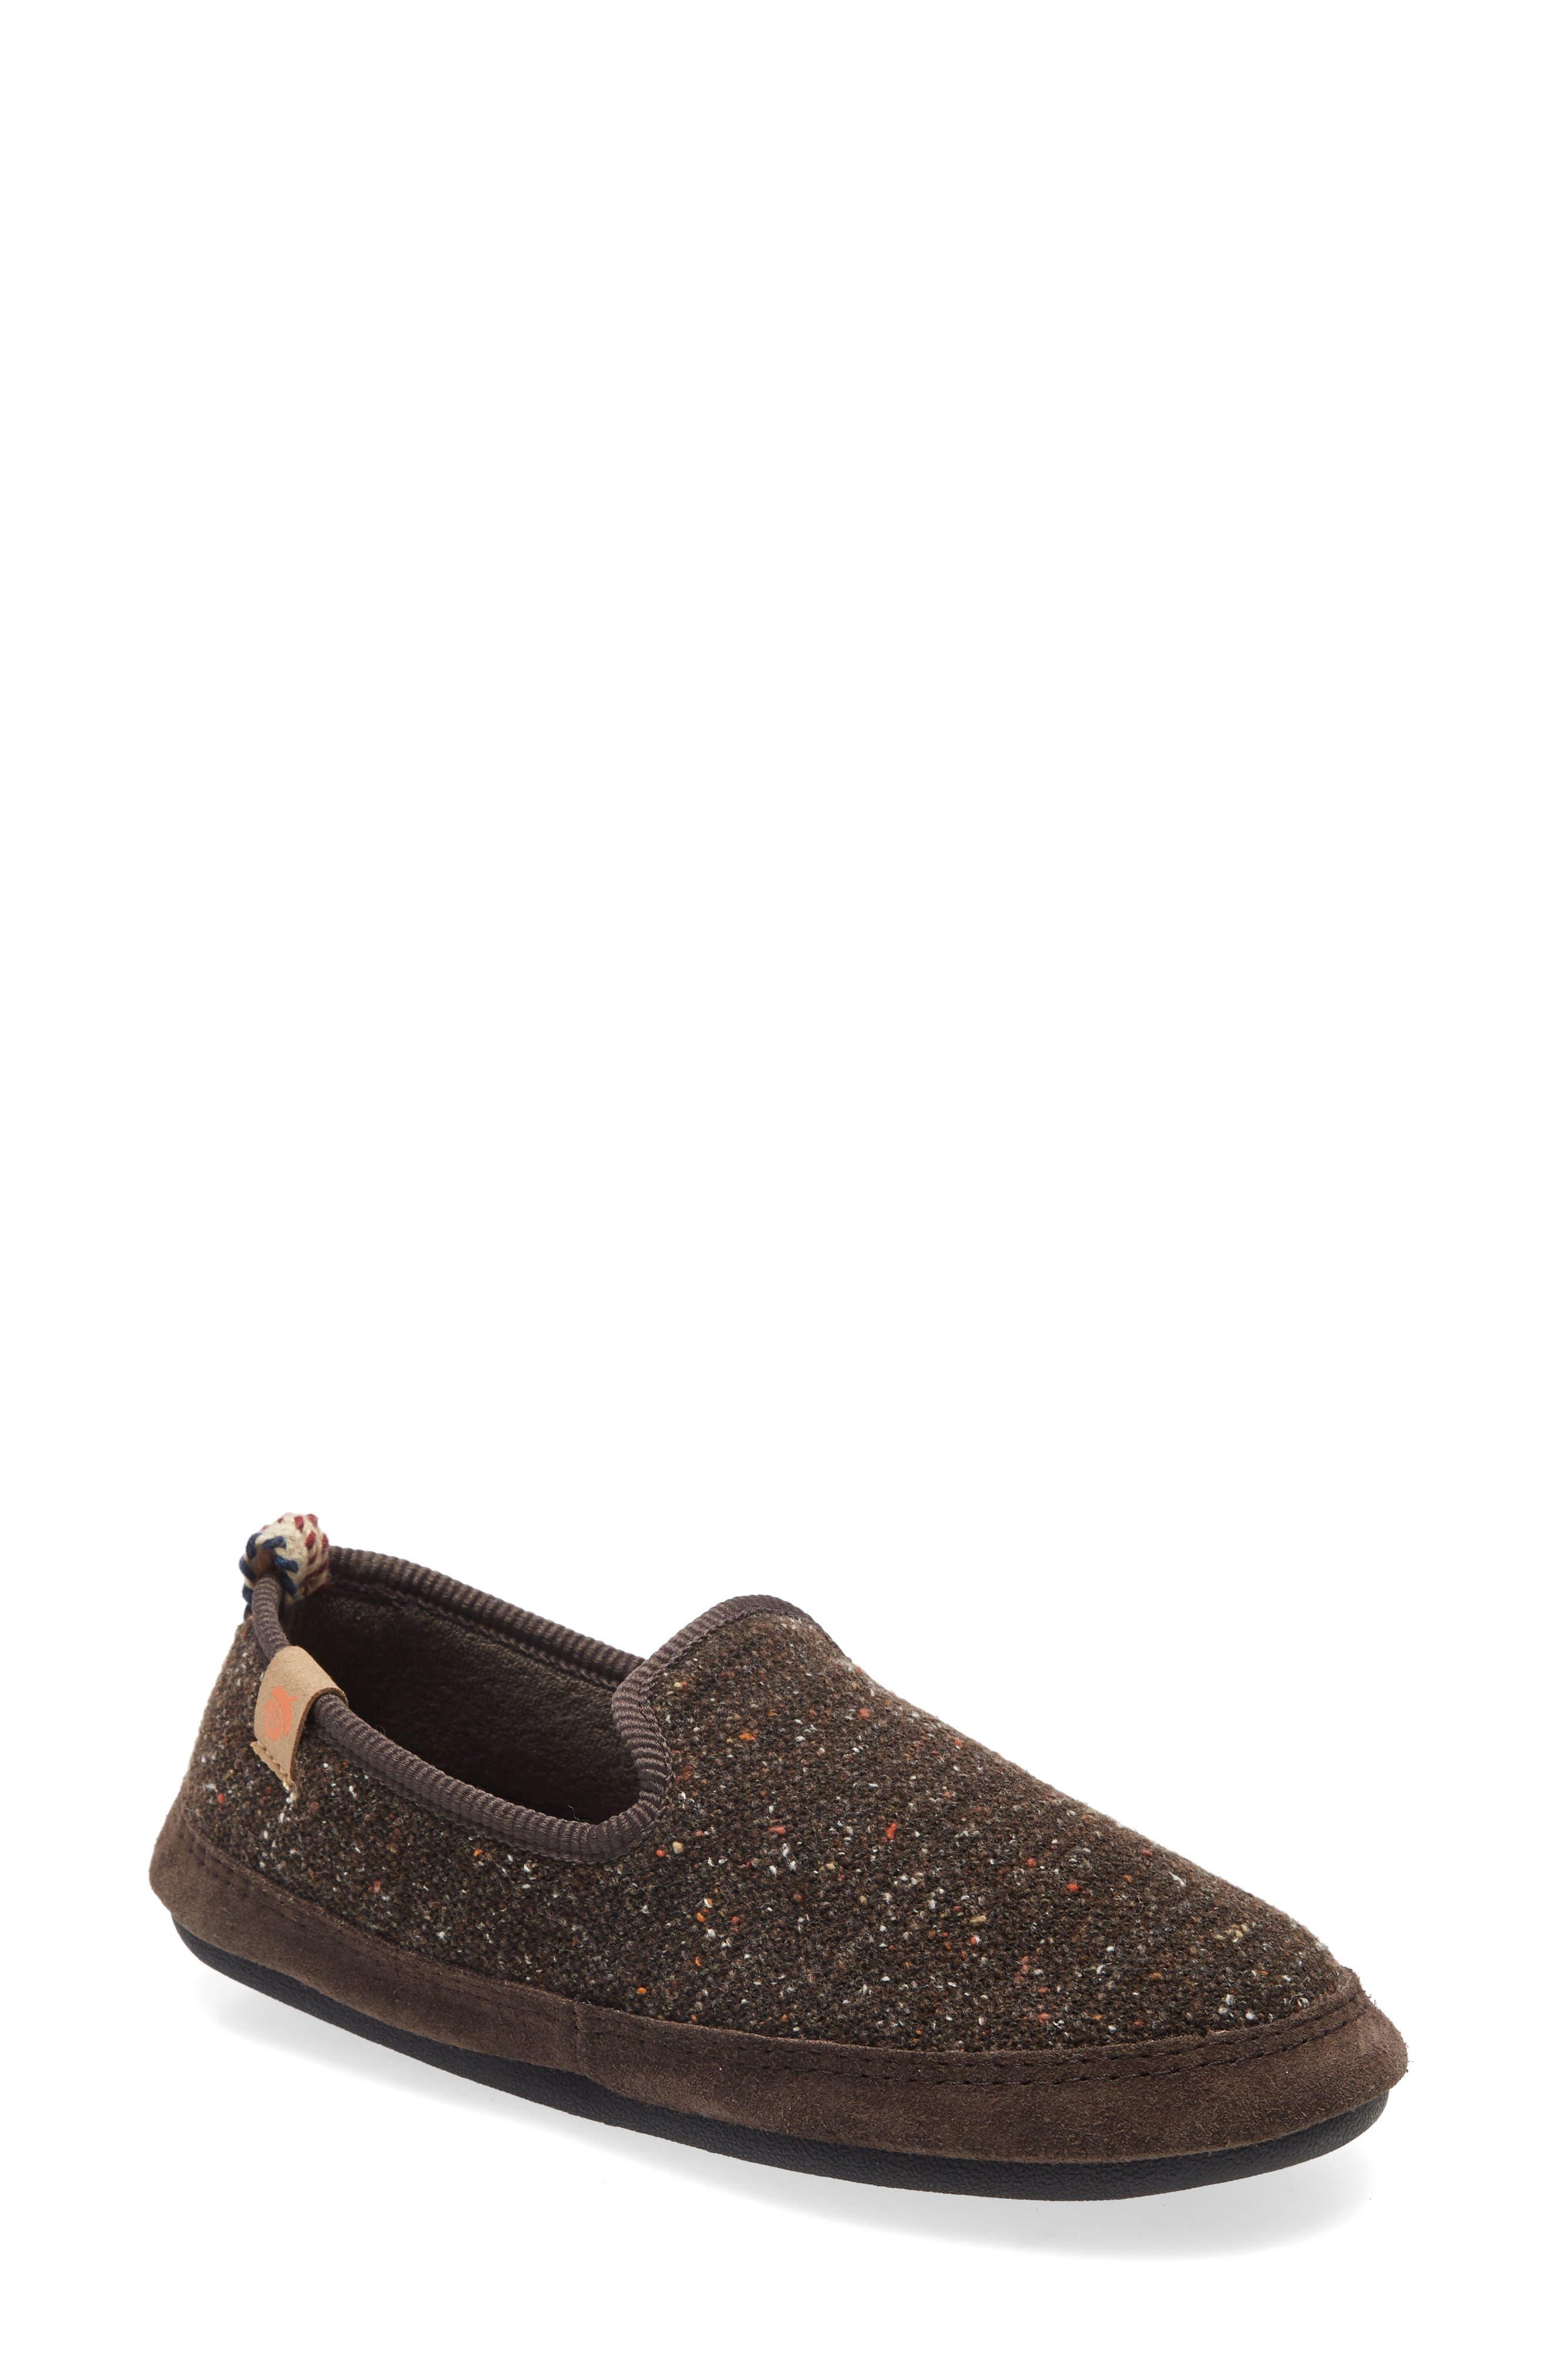 Bristol Loafer Slipper